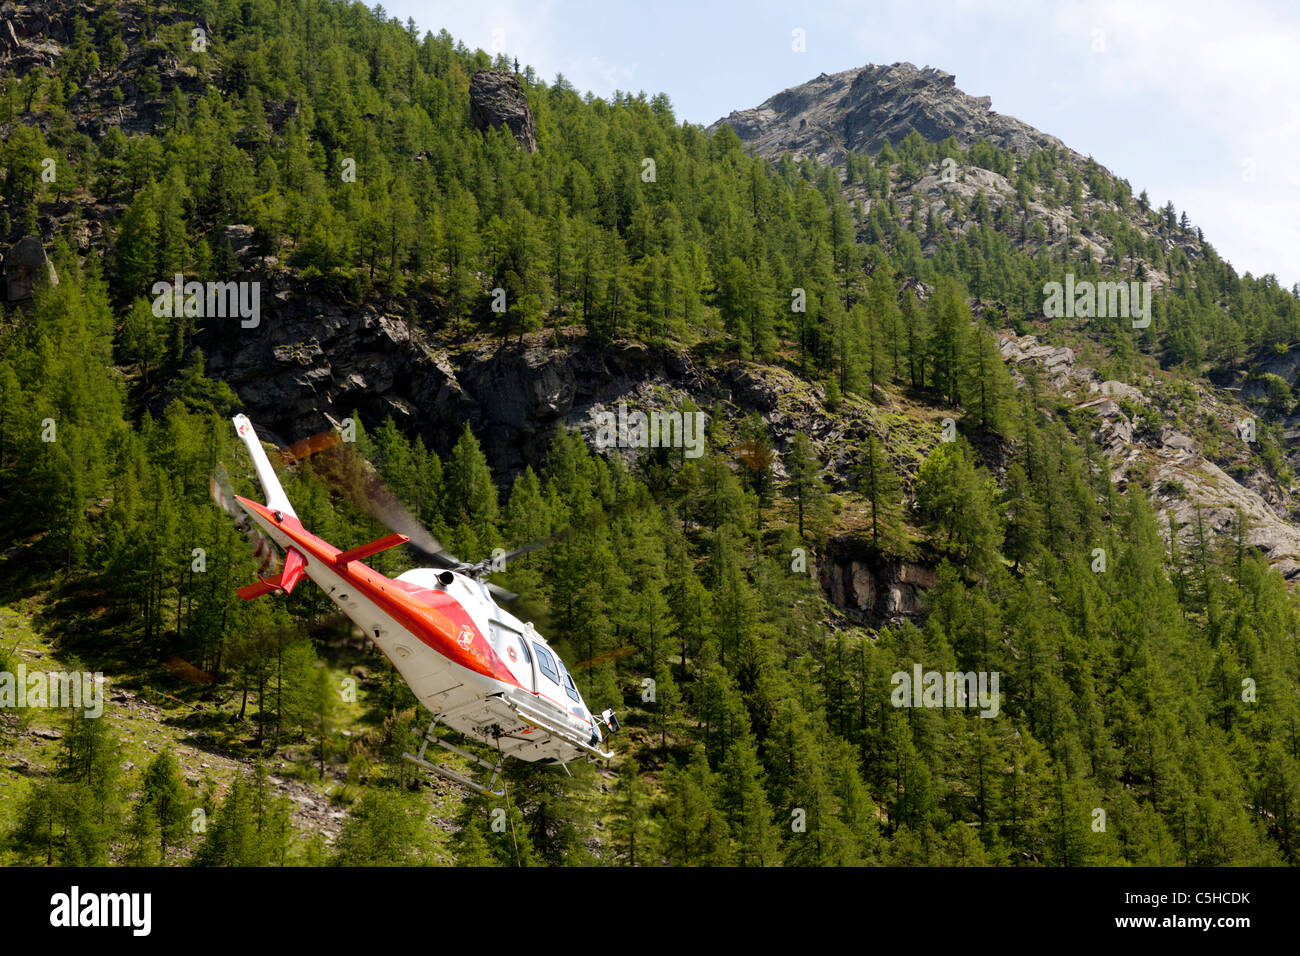 The approach of a mountainous site by a helicopter (Italy). Approche d'un site en montagne par hélicoptère - Stock Image